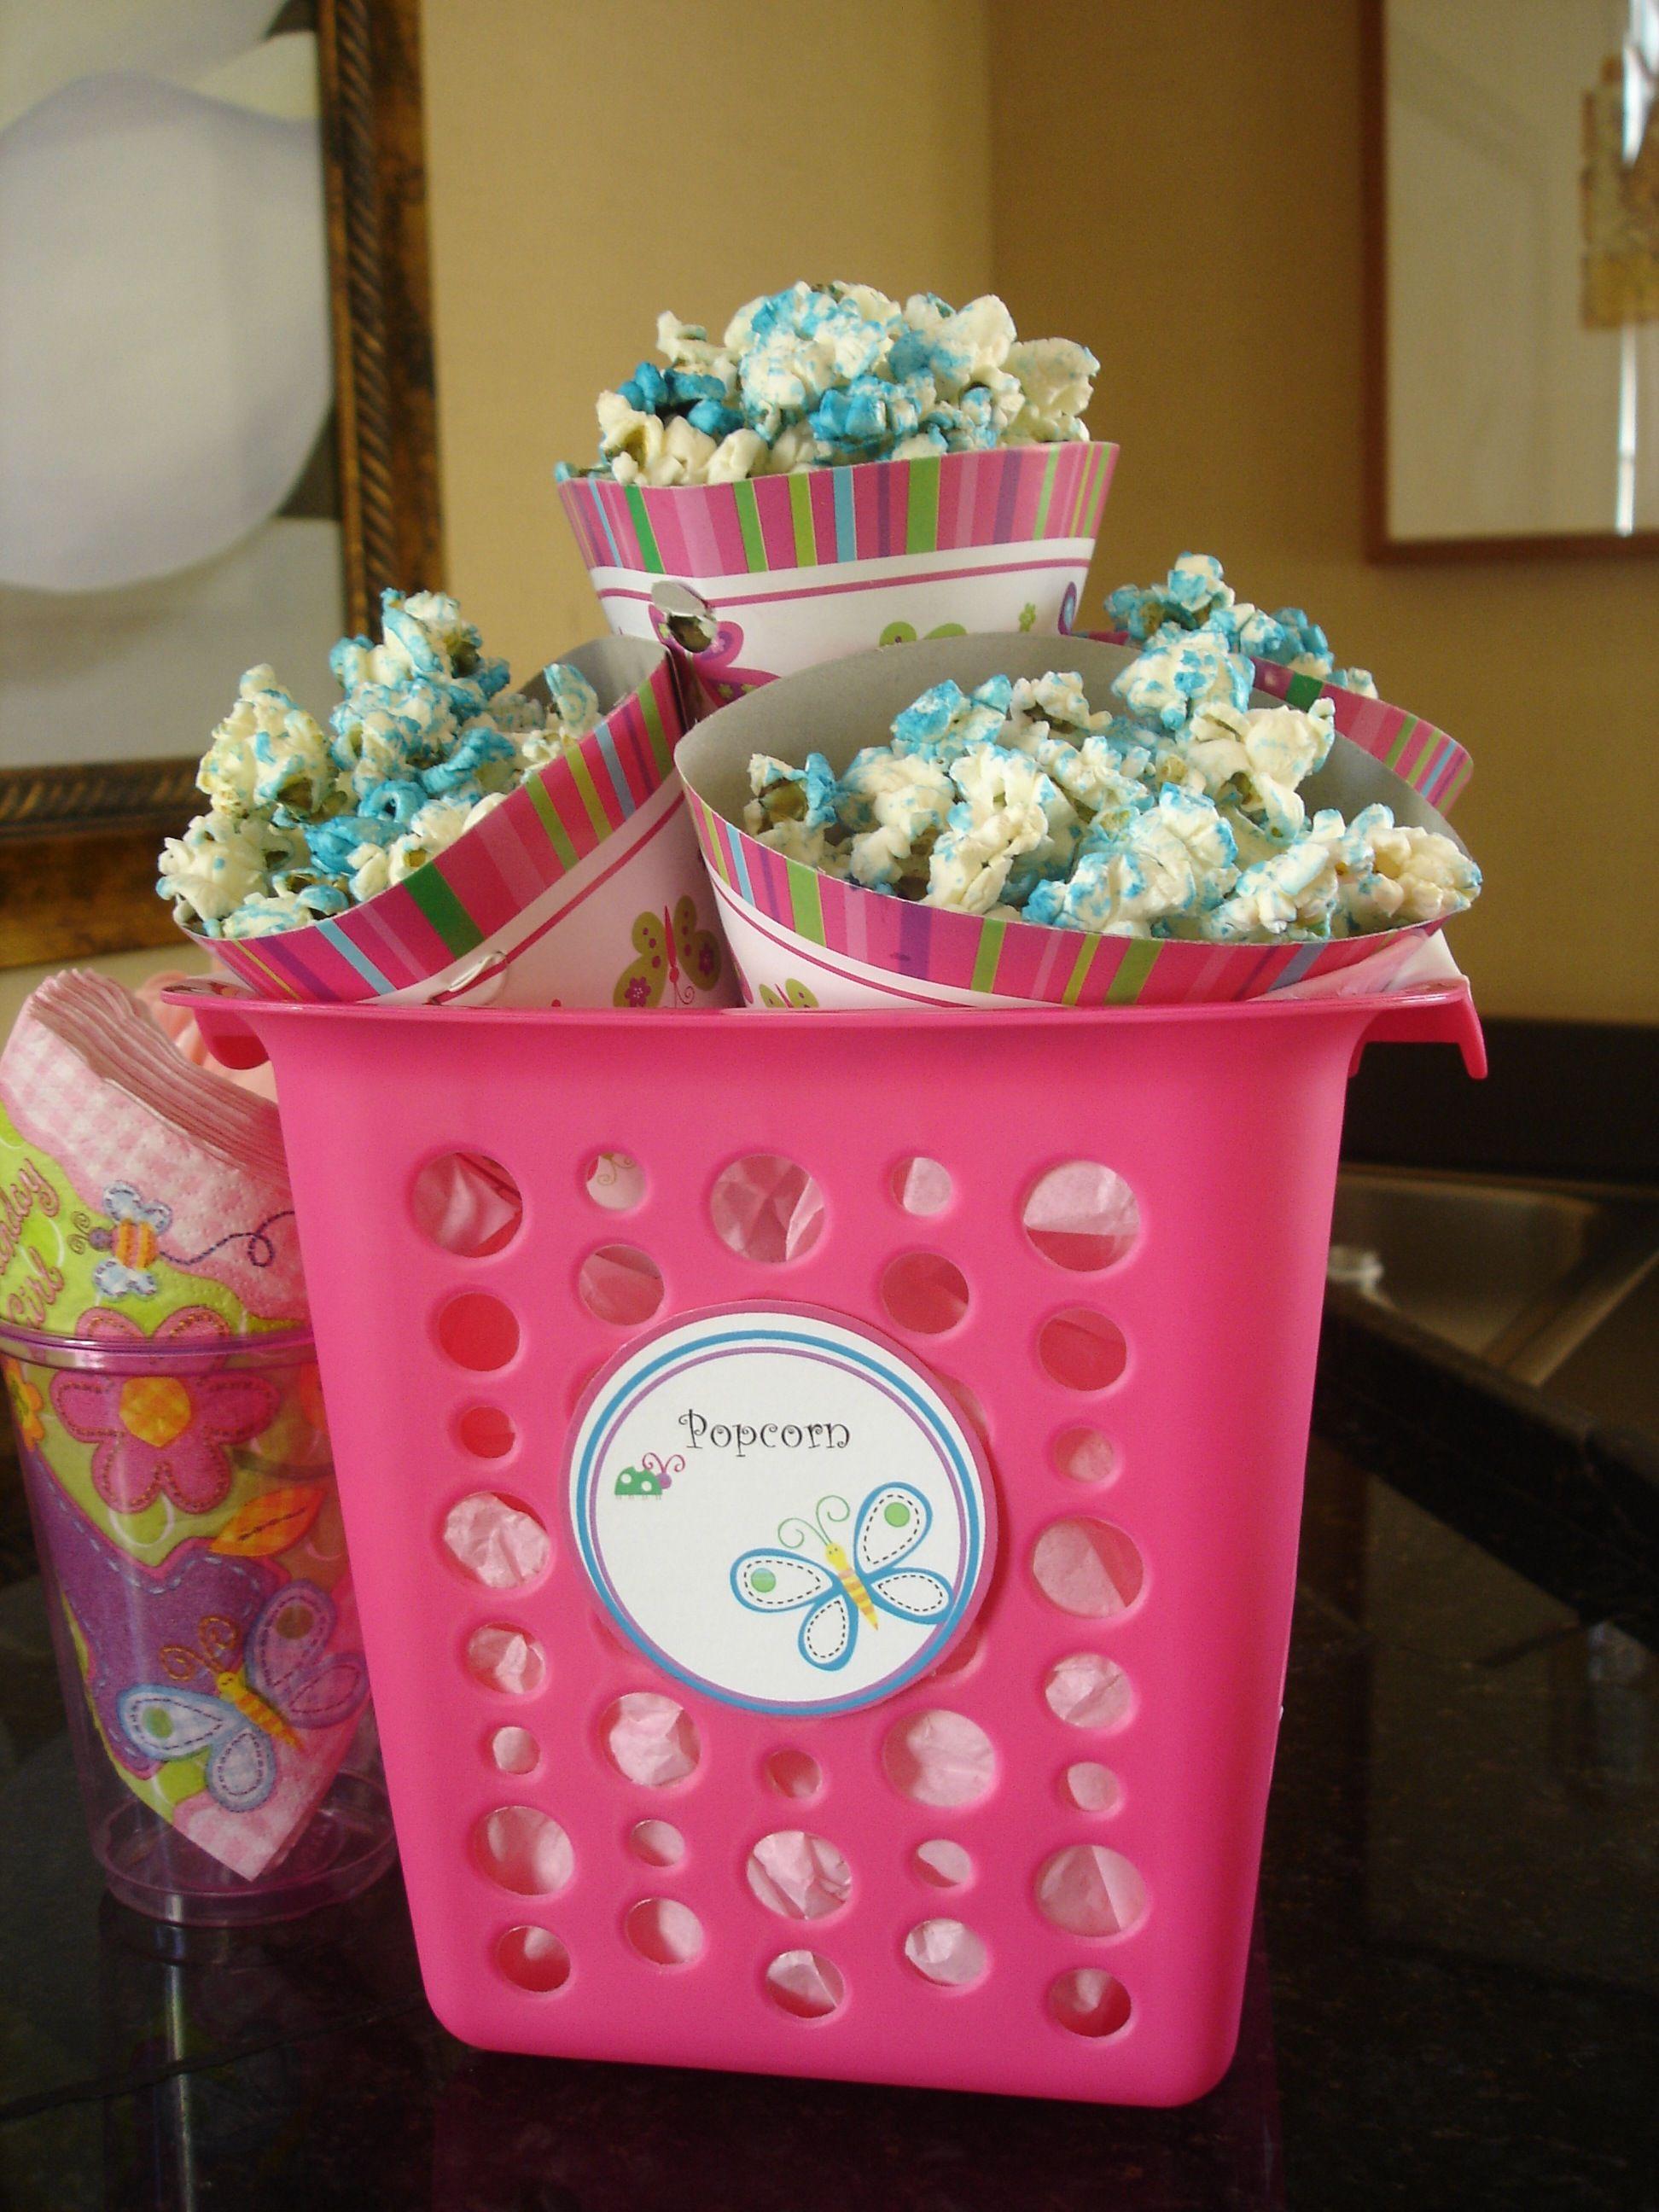 My Blue Popcorn | Yum Yum :) | Pinterest | Blue popcorn, Popcorn and ...